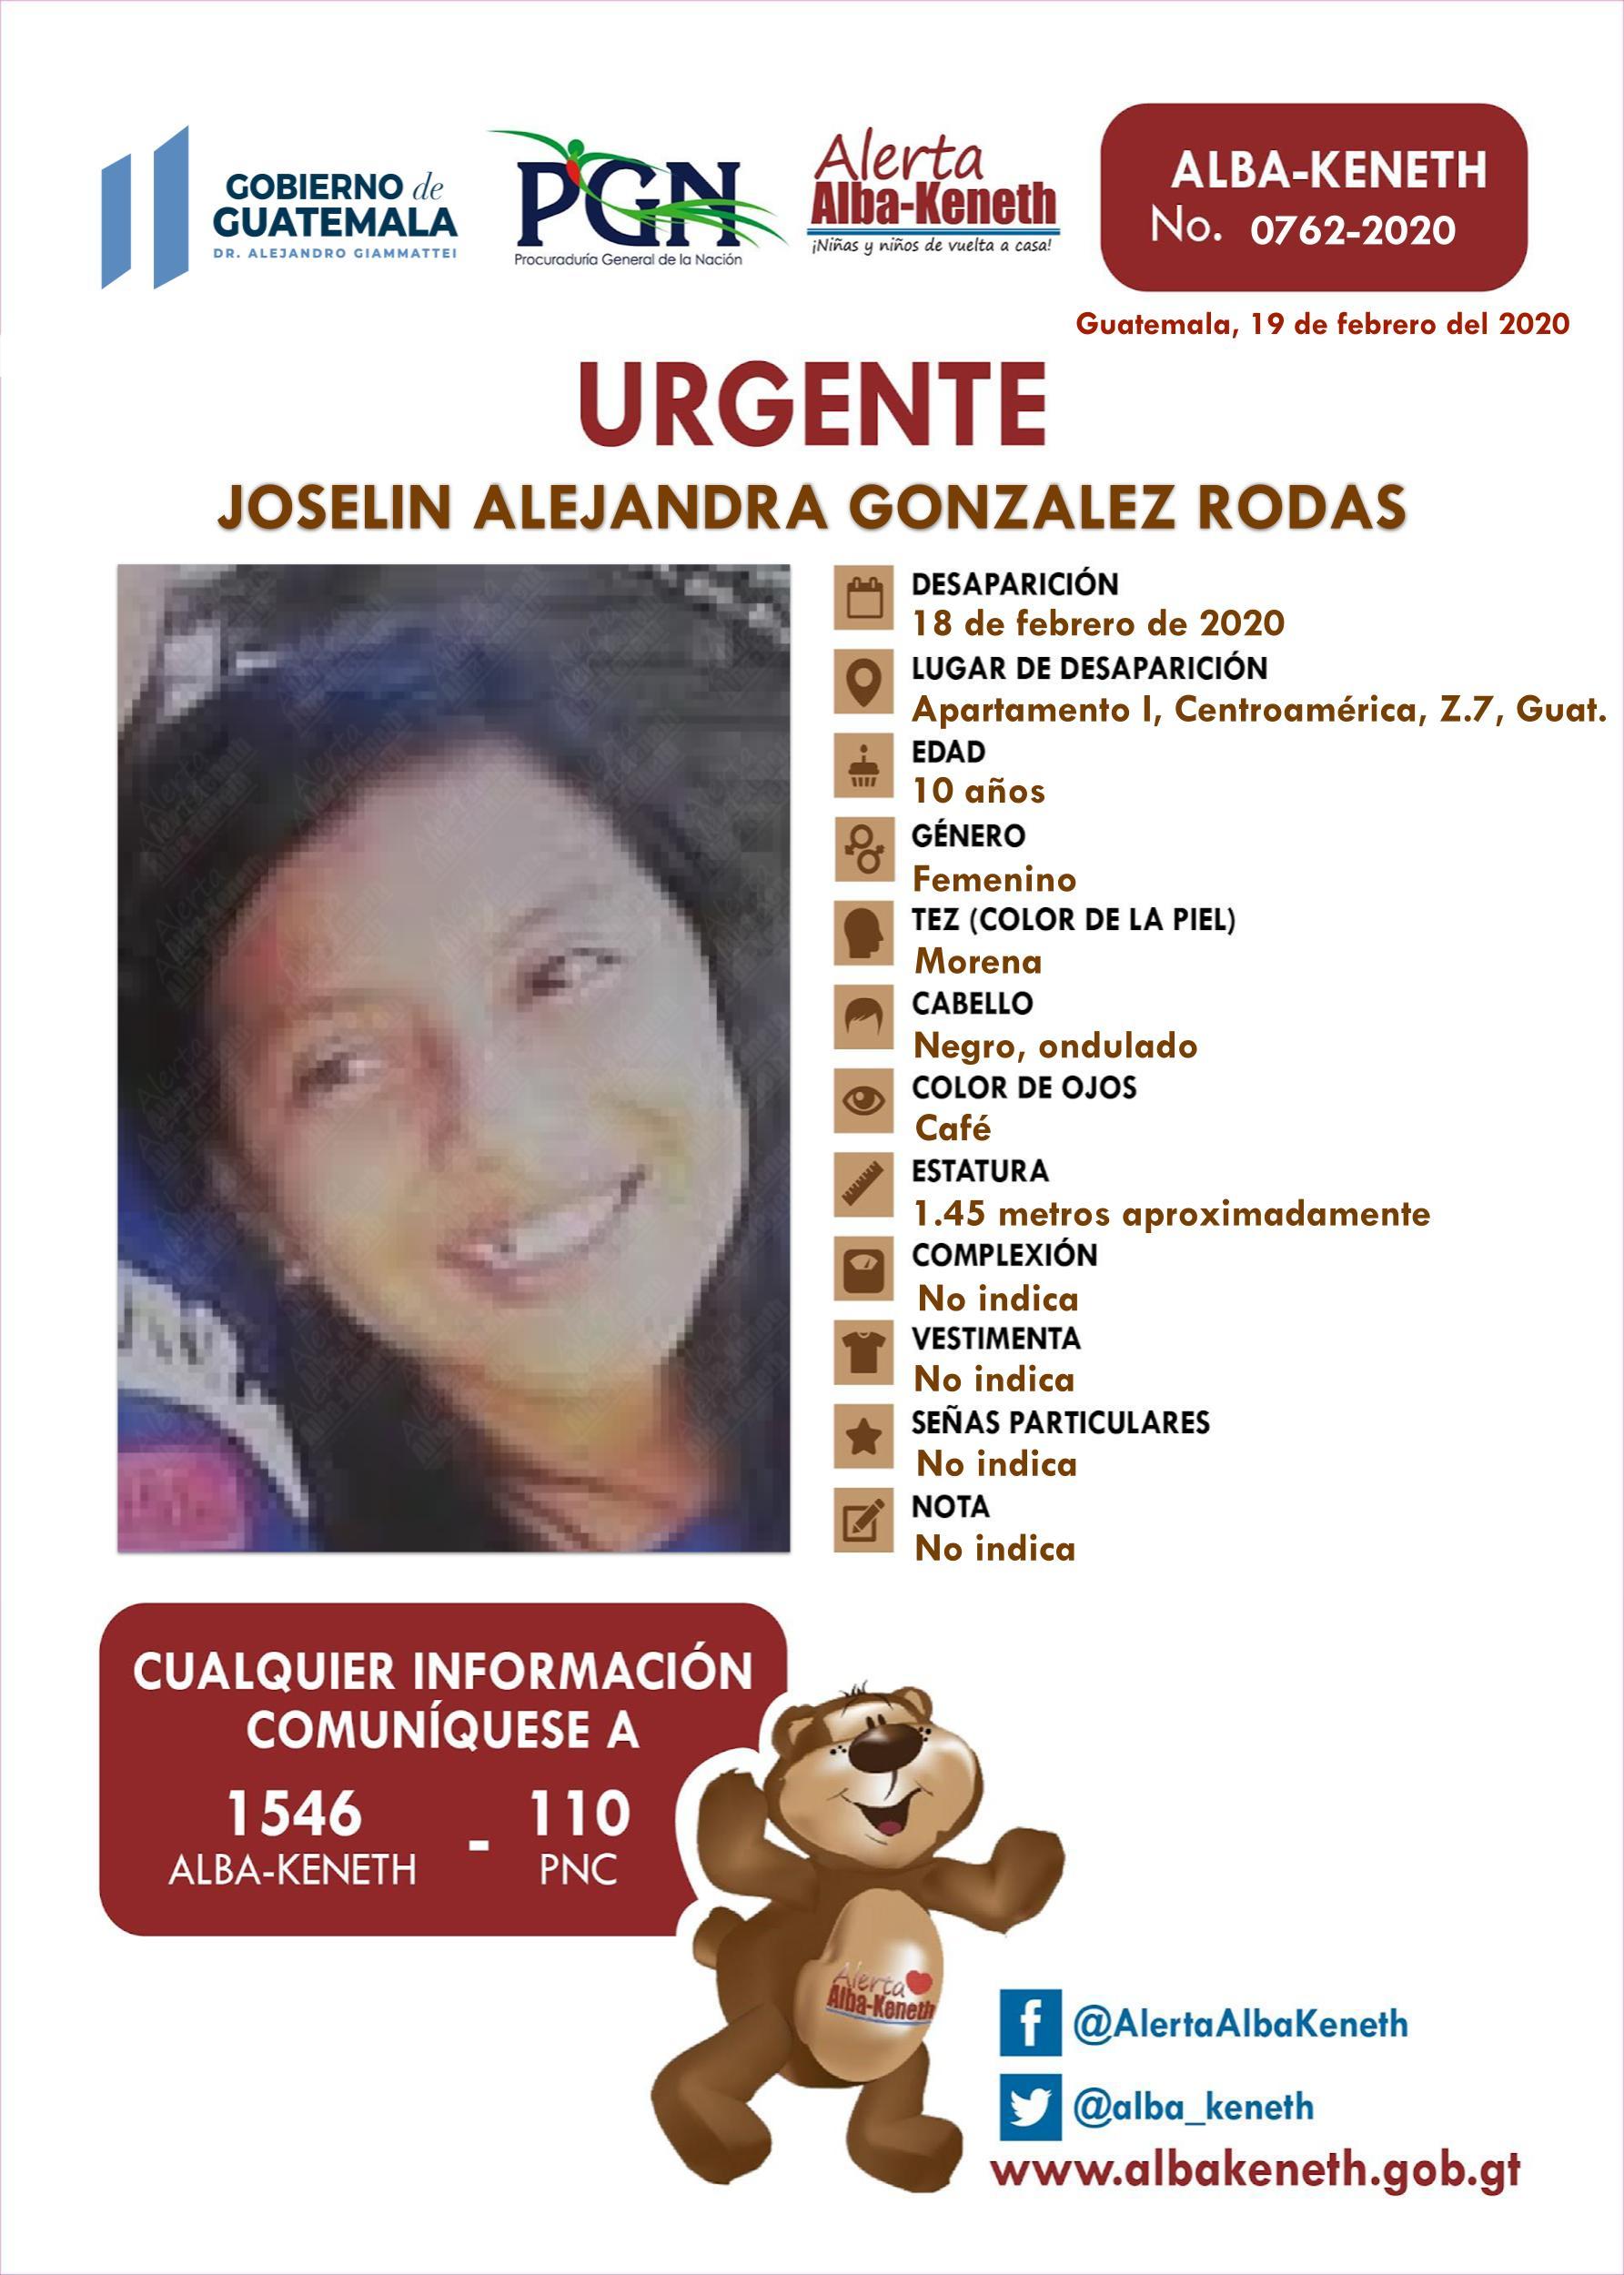 Joselin Alejandra Gonzalez Rodas